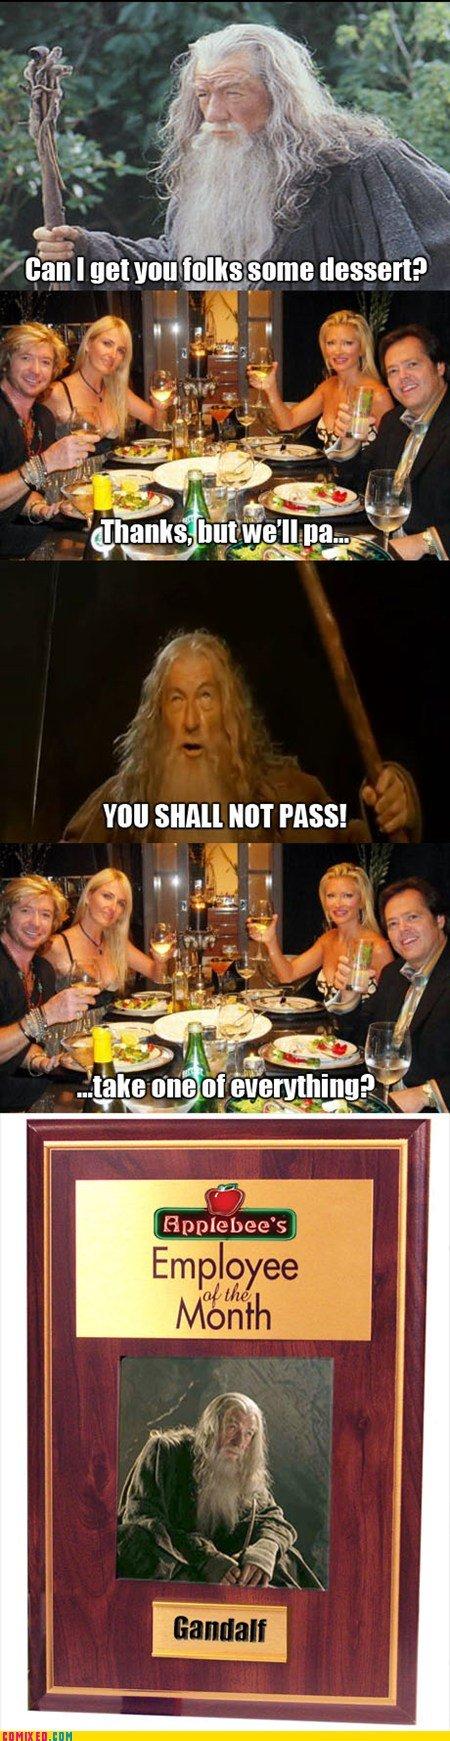 Gandalf_3ab16d_3240175.jpg